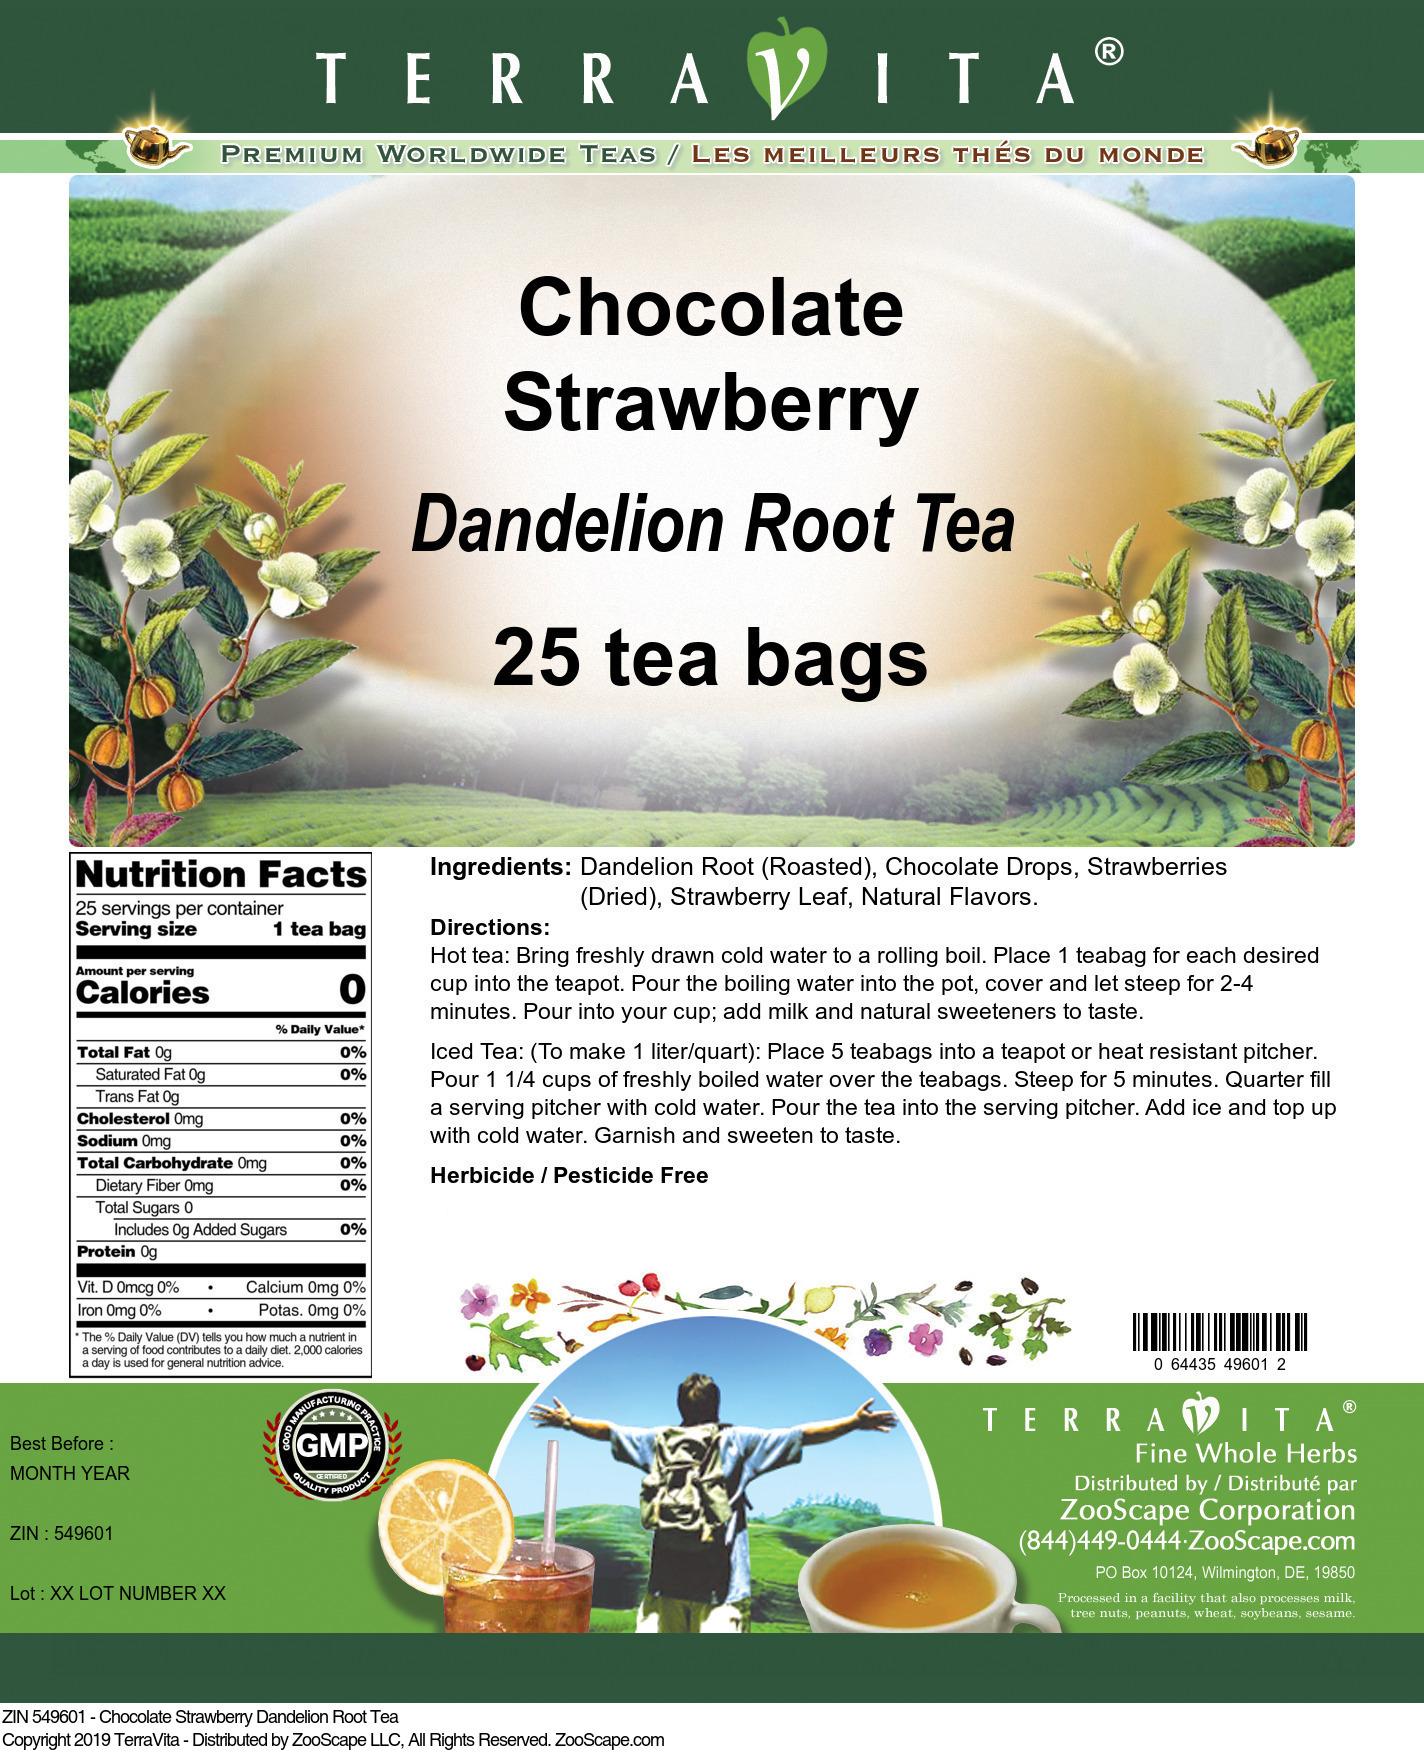 Chocolate Strawberry Dandelion Root Tea